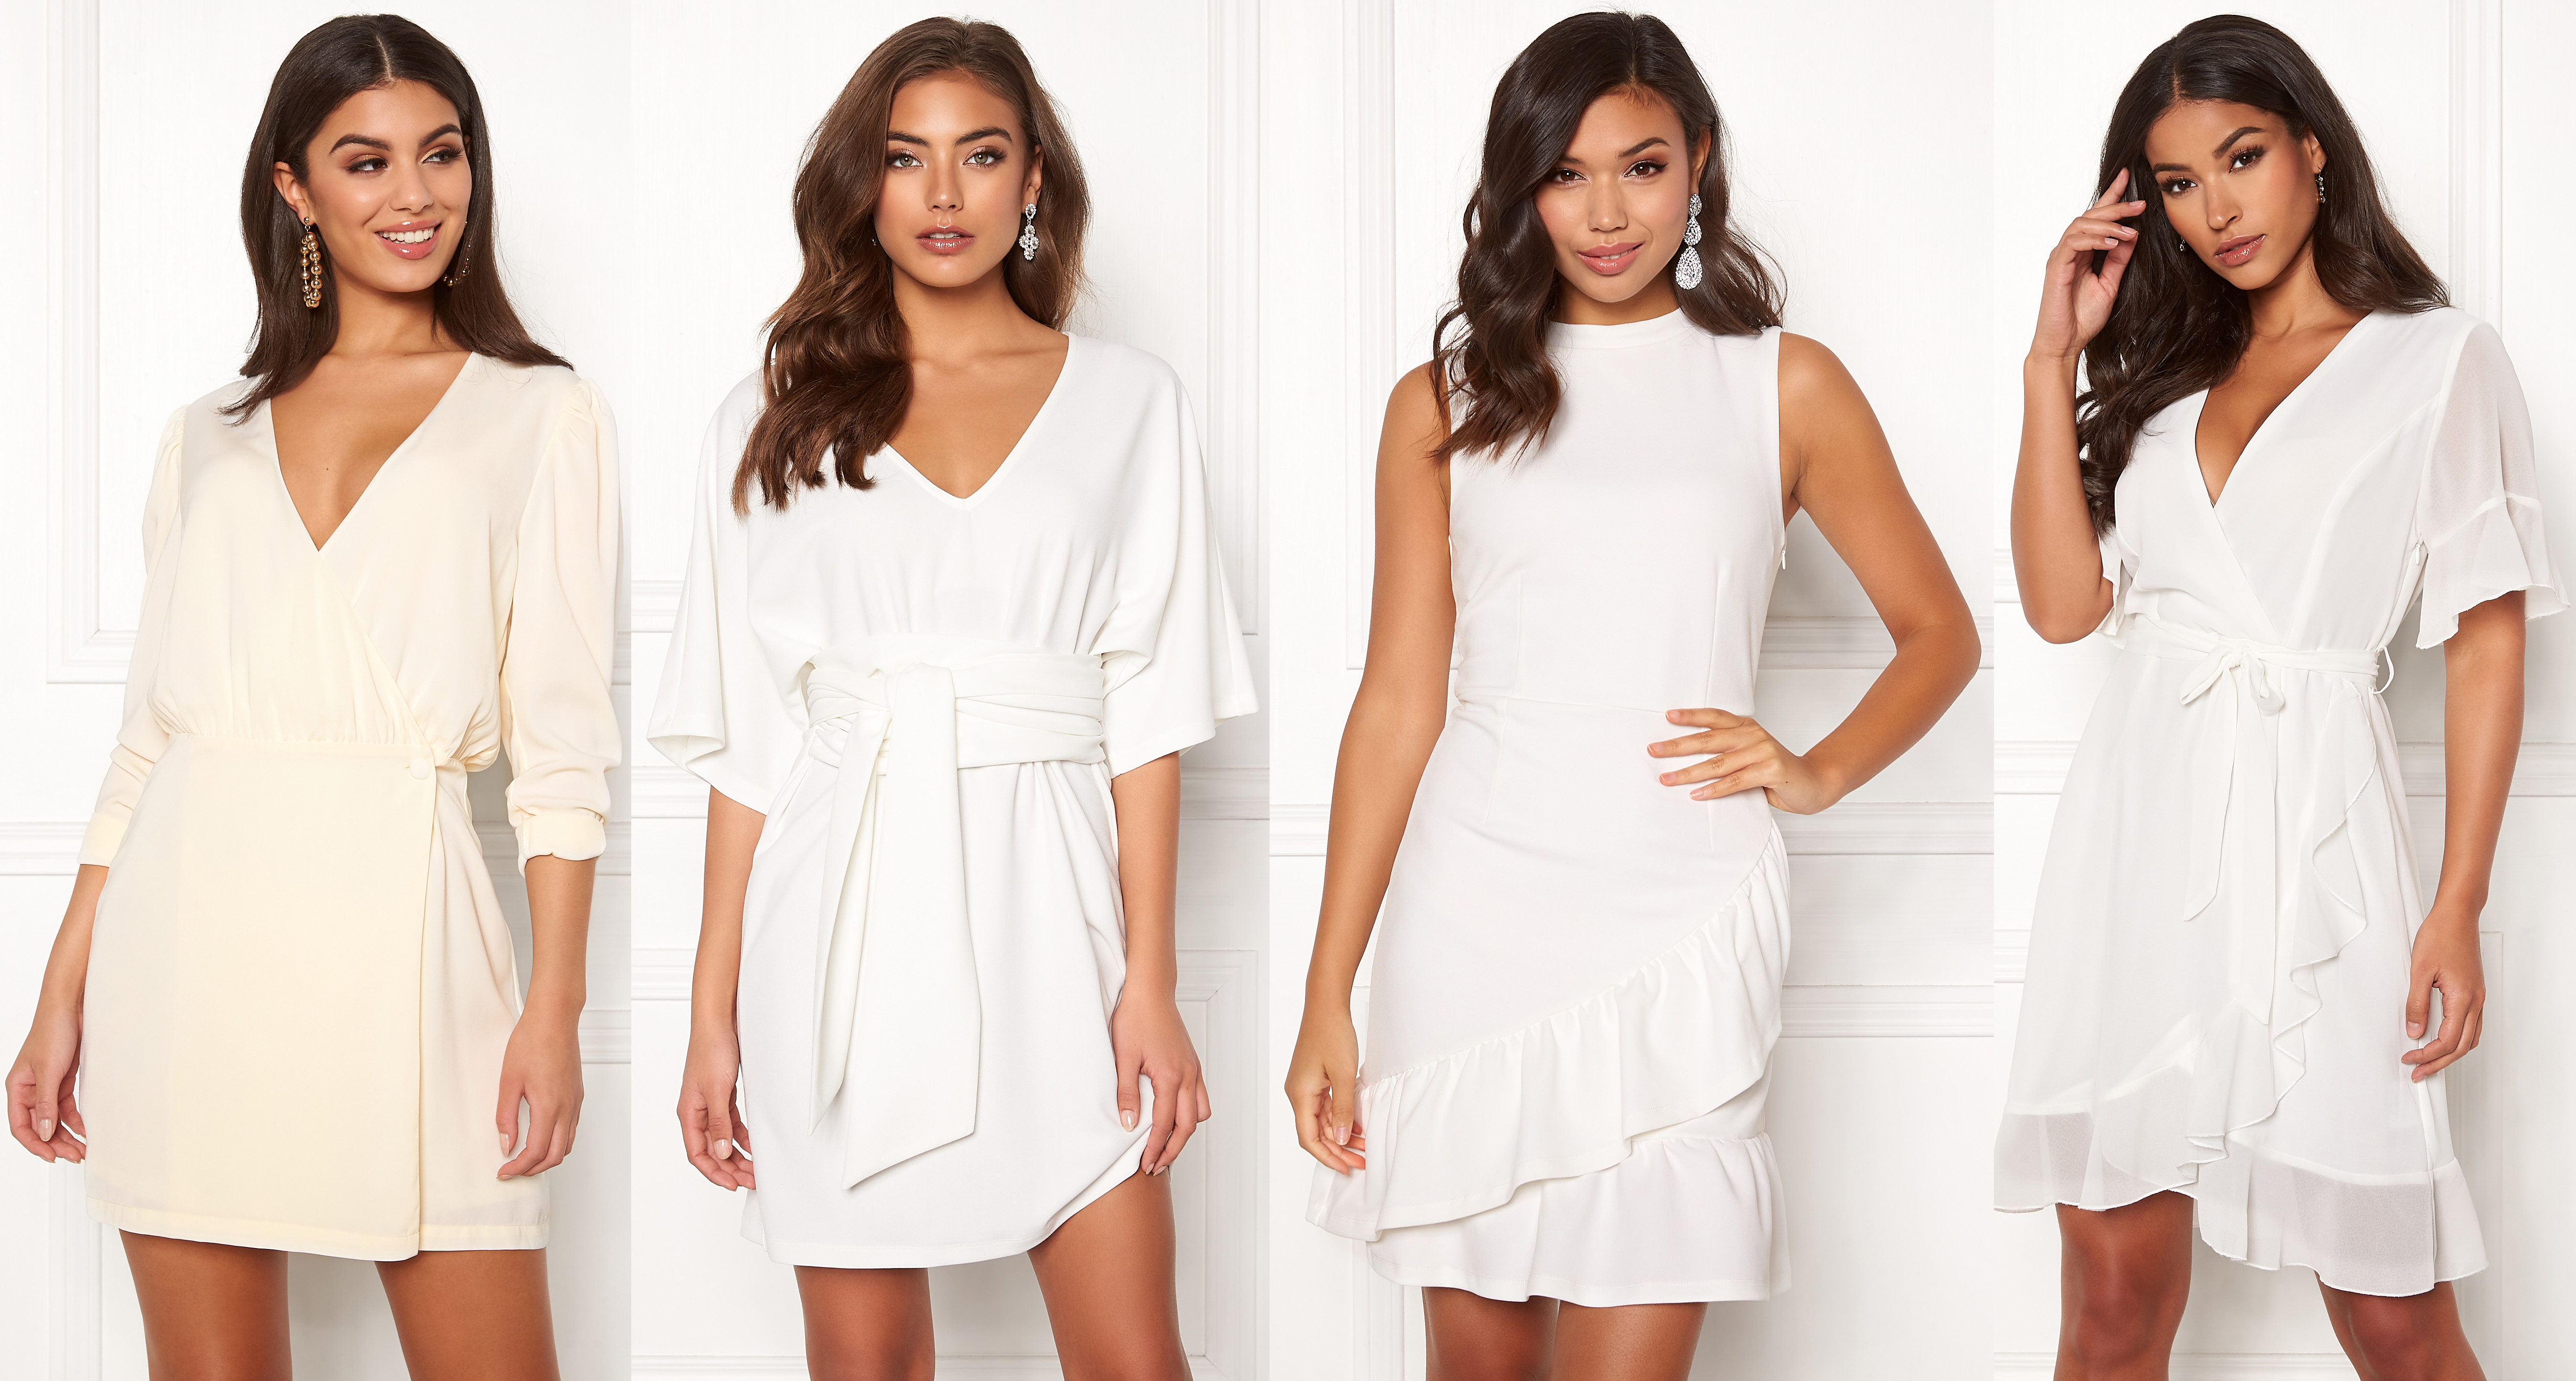 9b966aa19786 Vita vardagsklänningar korta vita klänningar